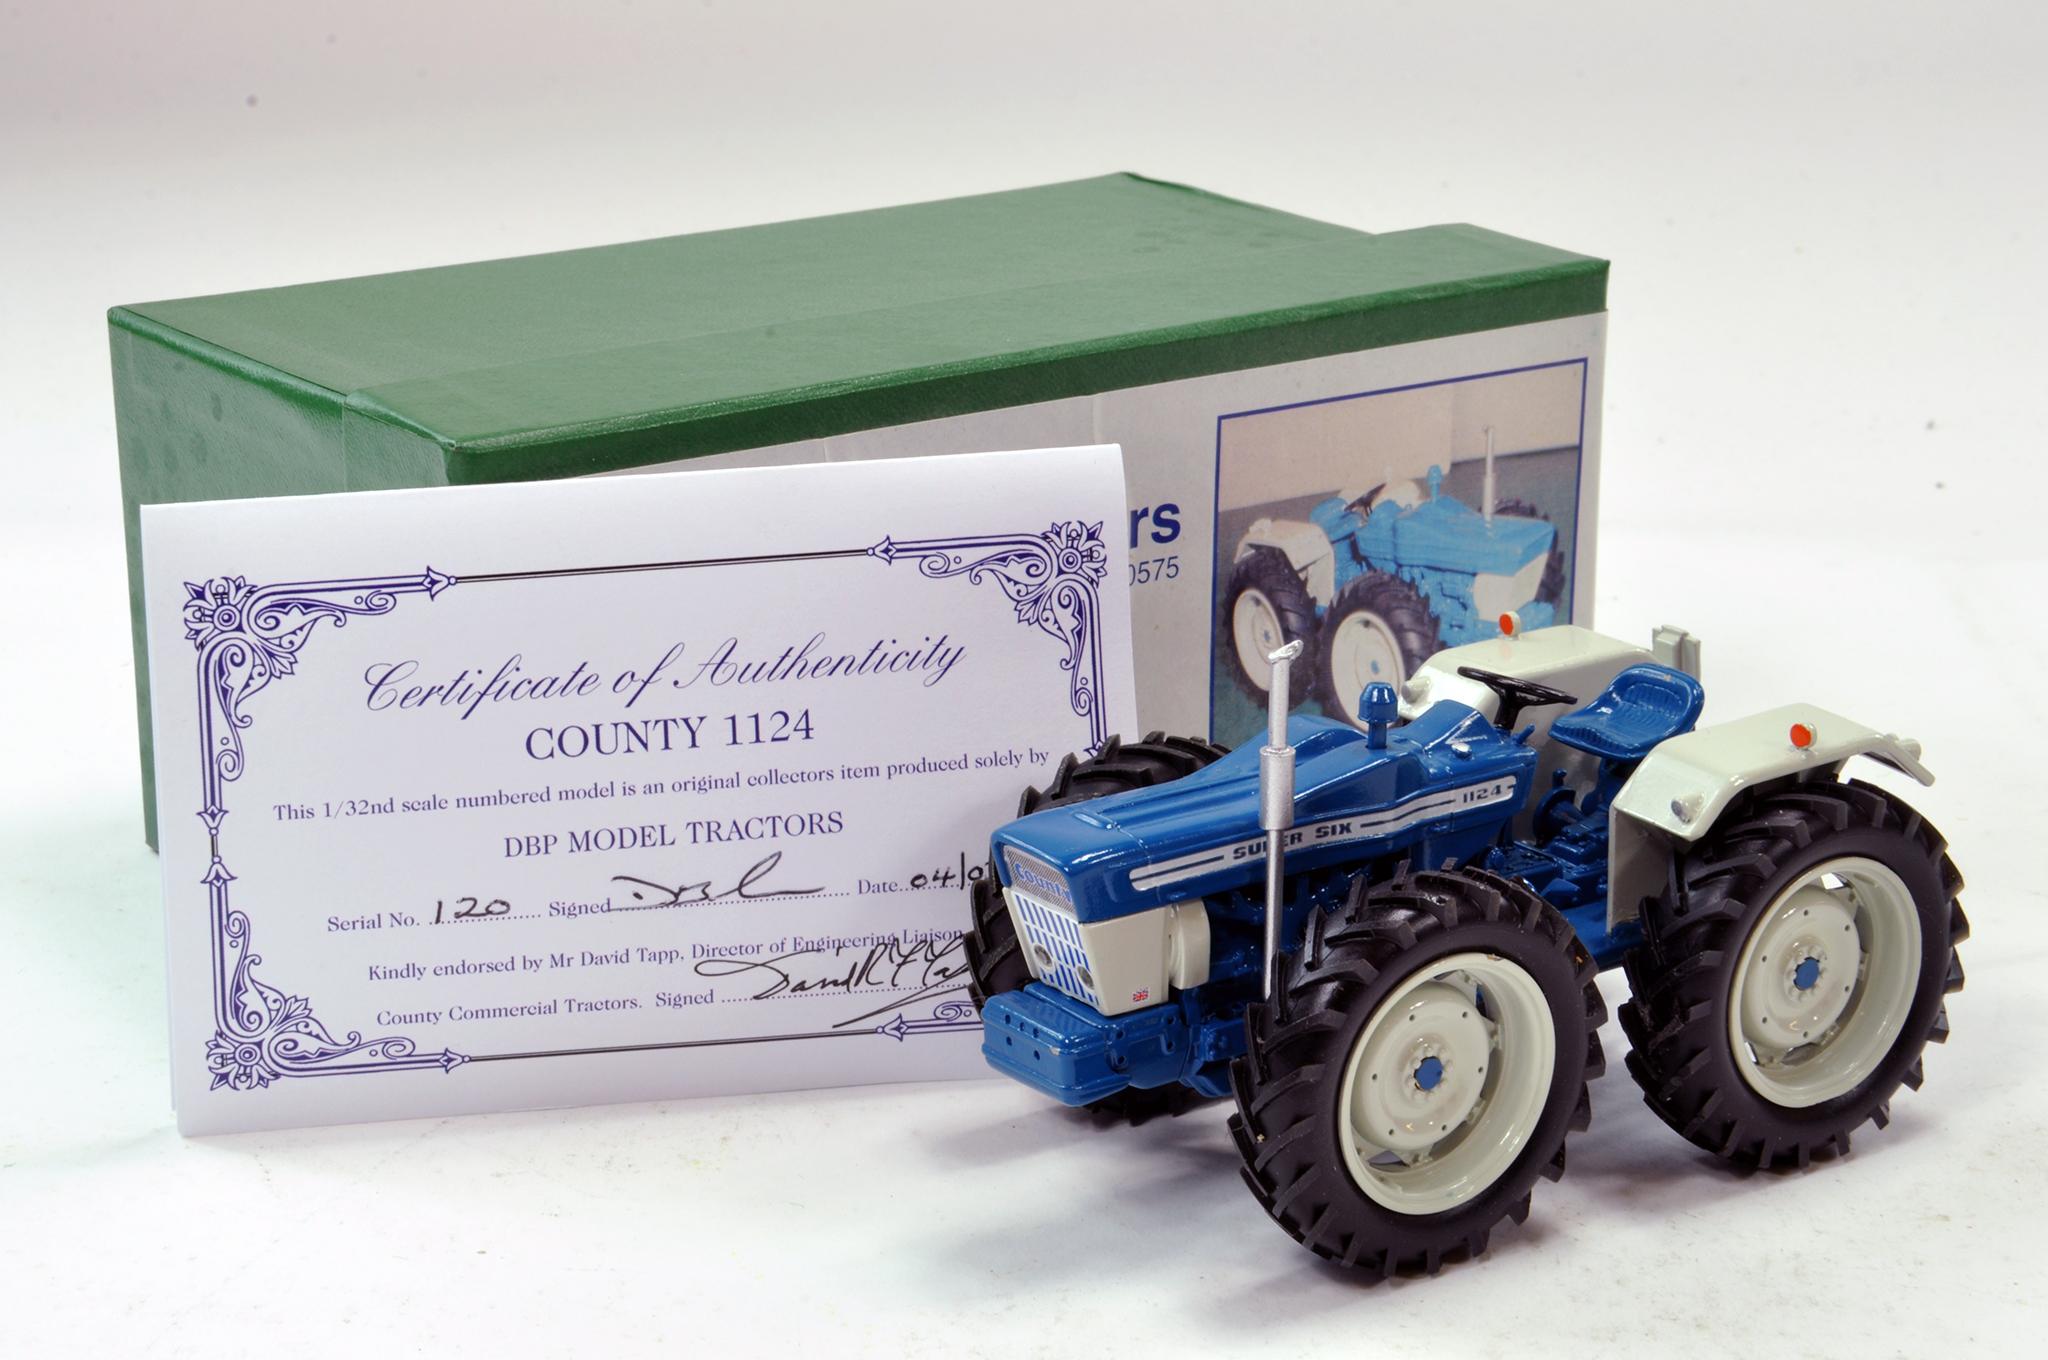 Lot 249 - DBP Models 1/32 Hand Built County 1124 Super Six Tractor. Superb model is excellent.